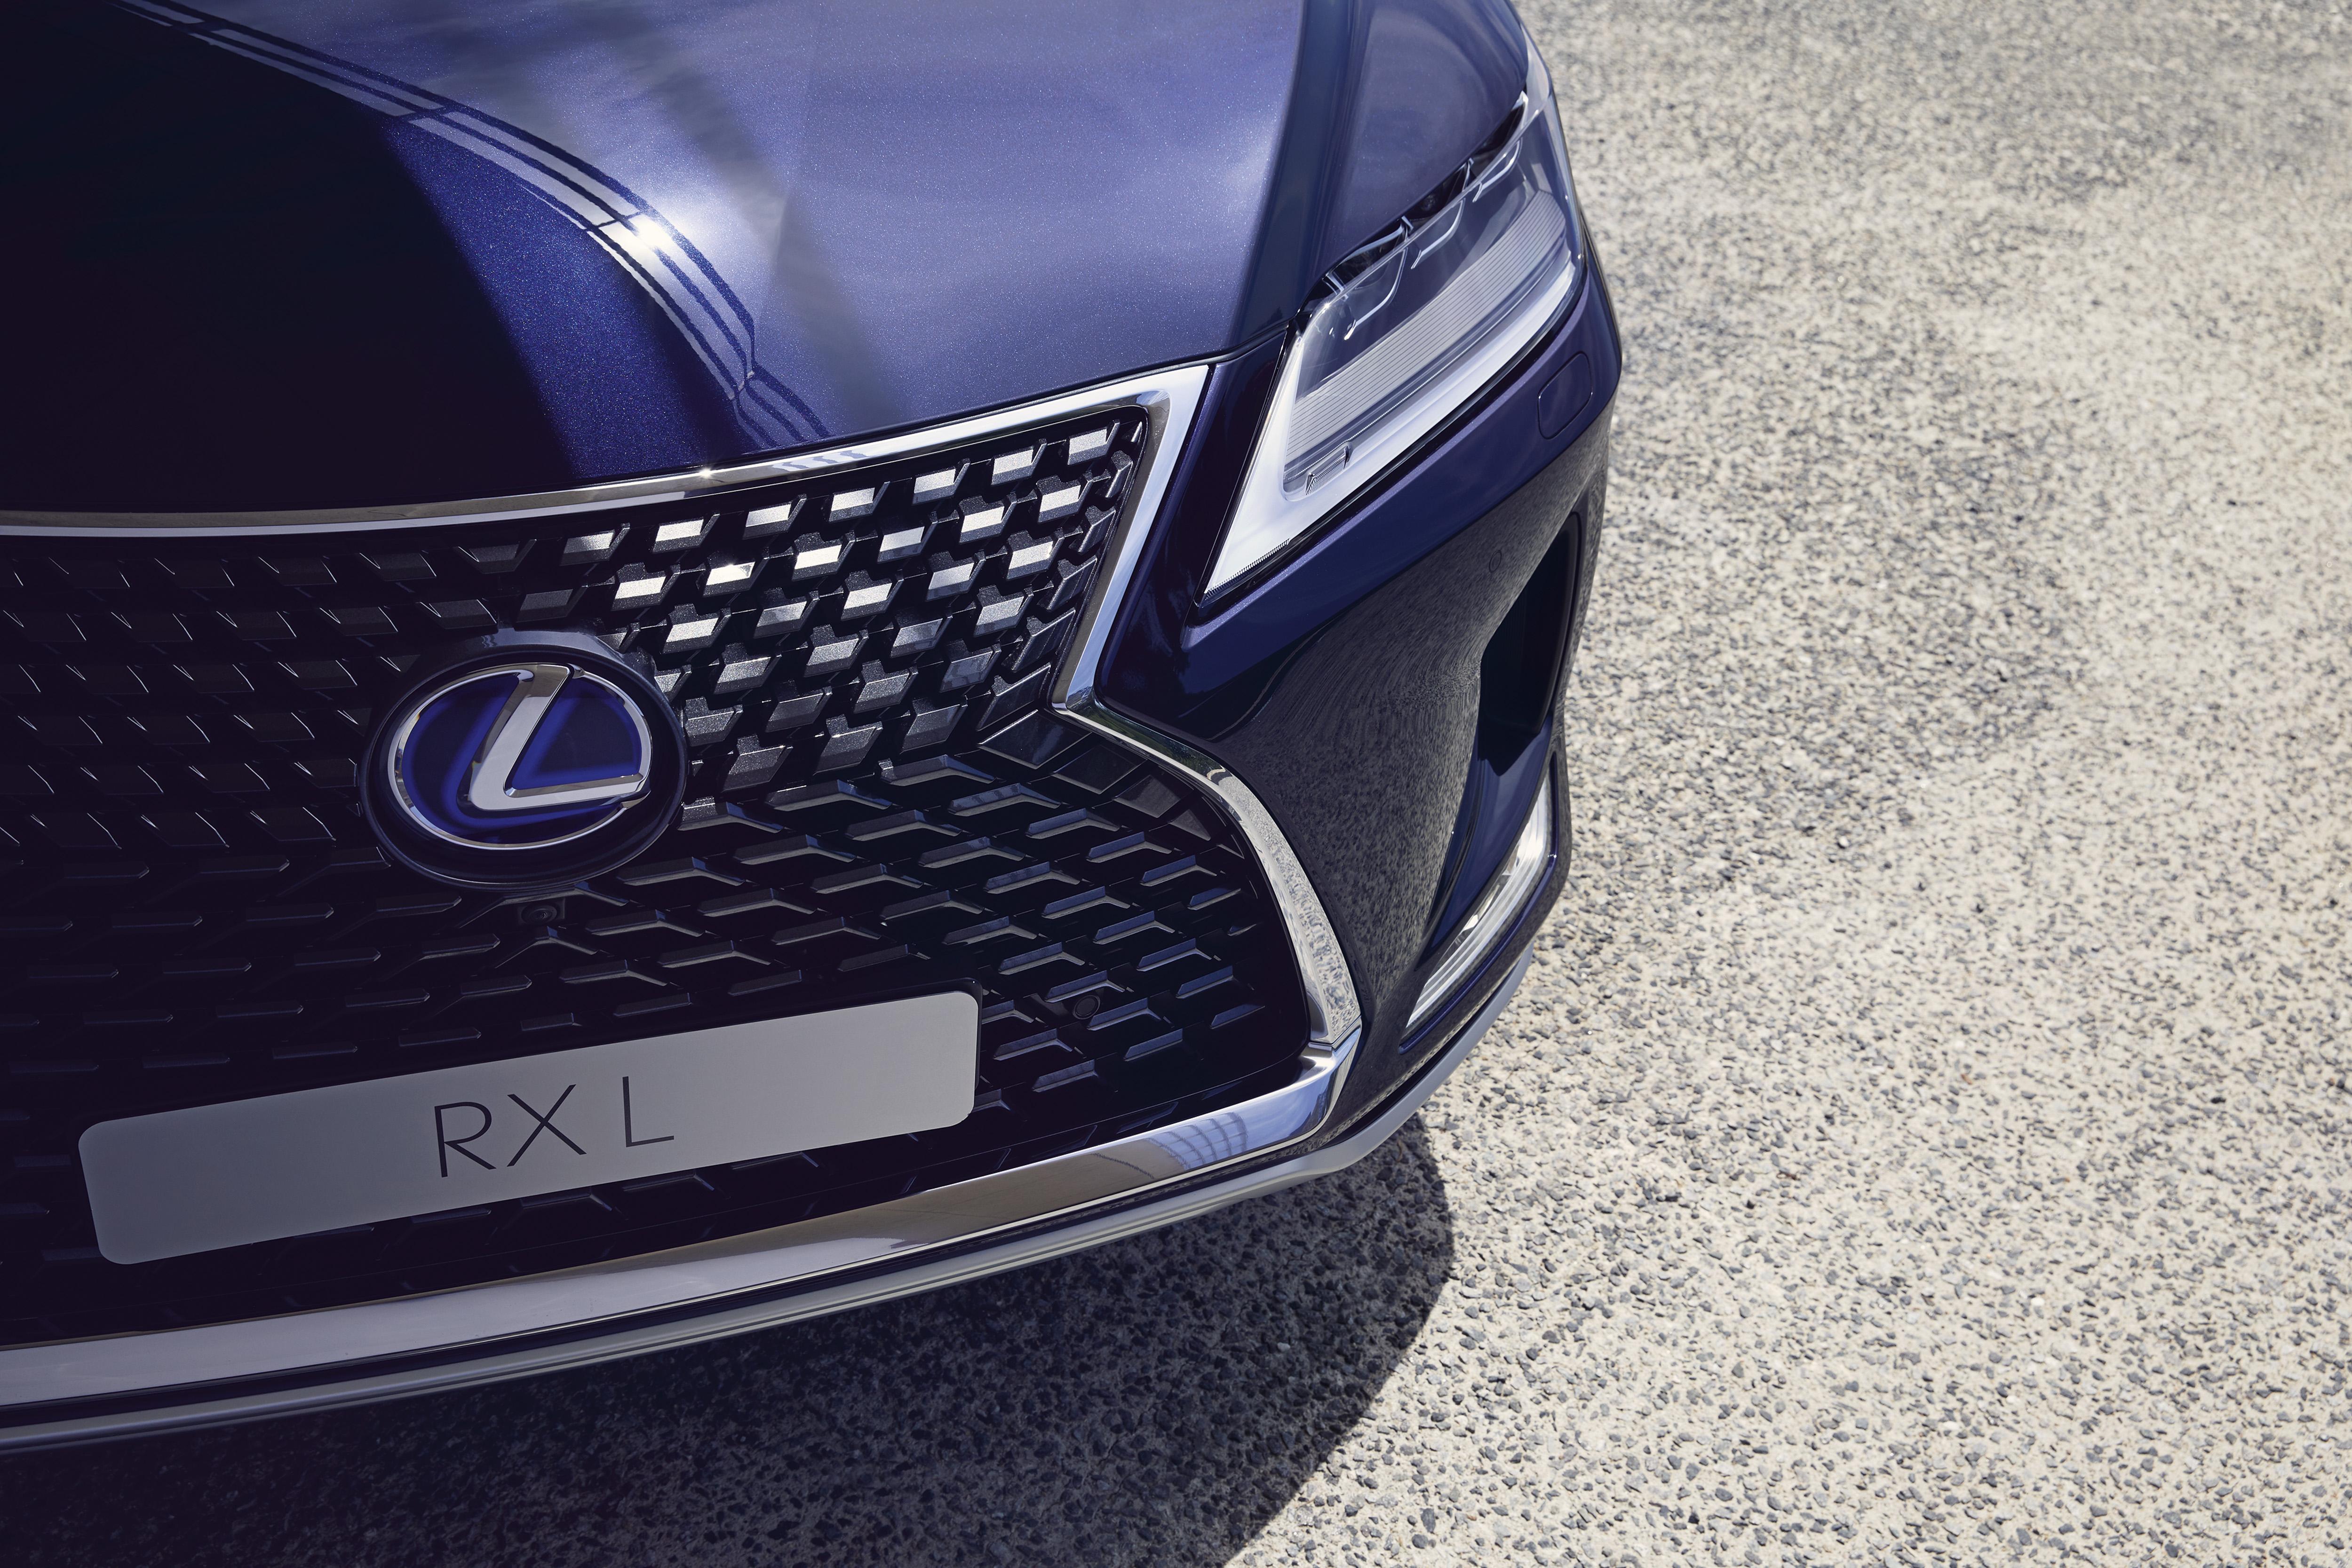 2020 rx450hl luxury 3 991429 1